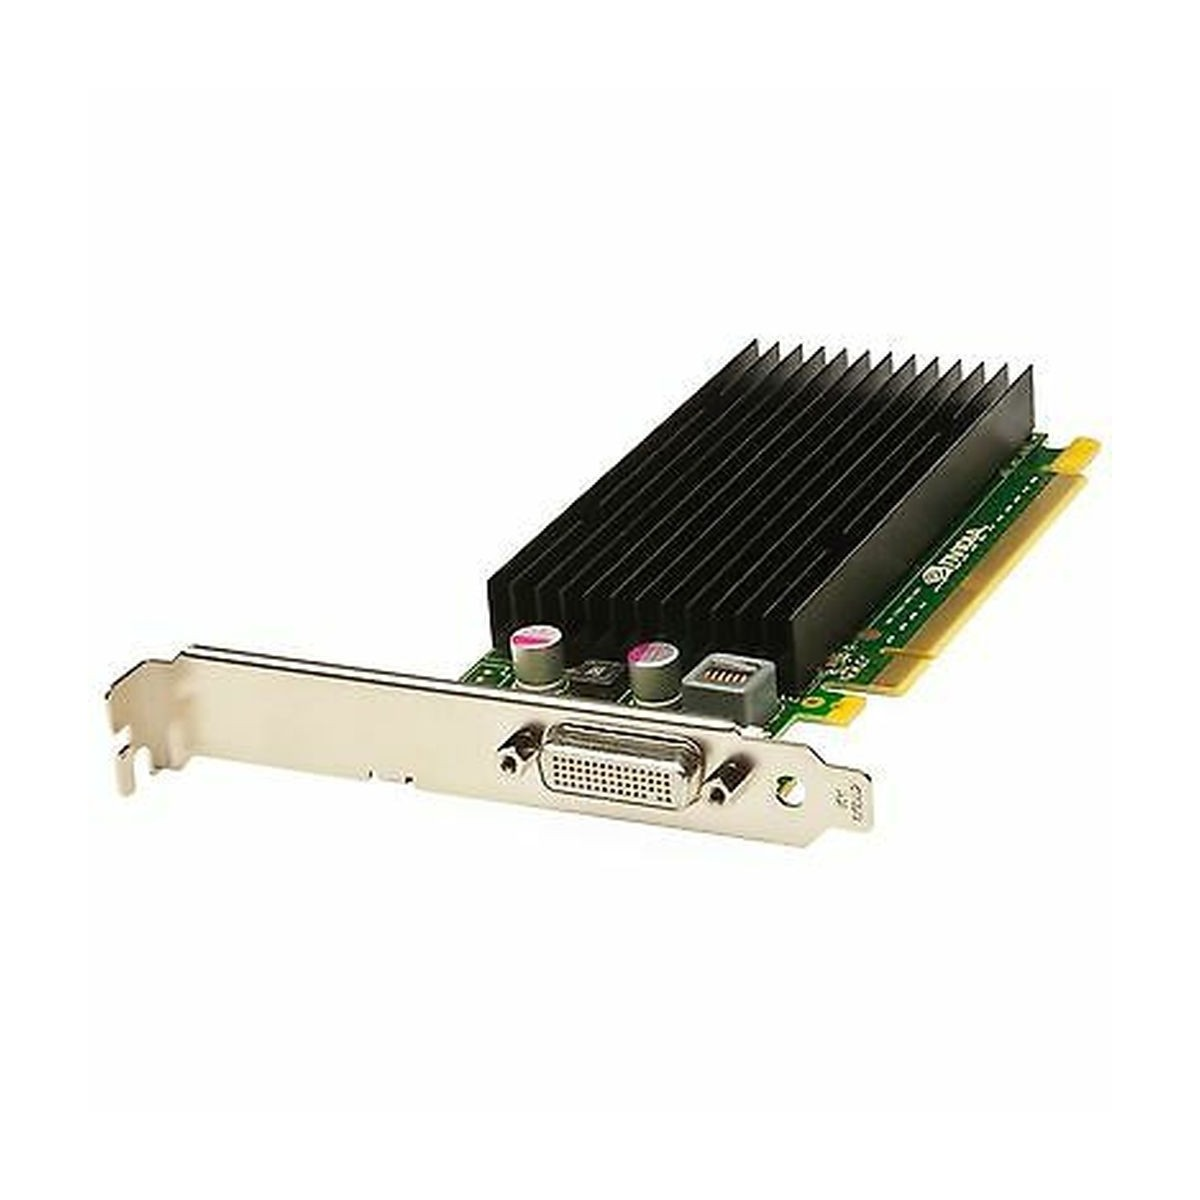 NVIDIA QUADRO NVS 510 2GB DDR3 4xMINI DP